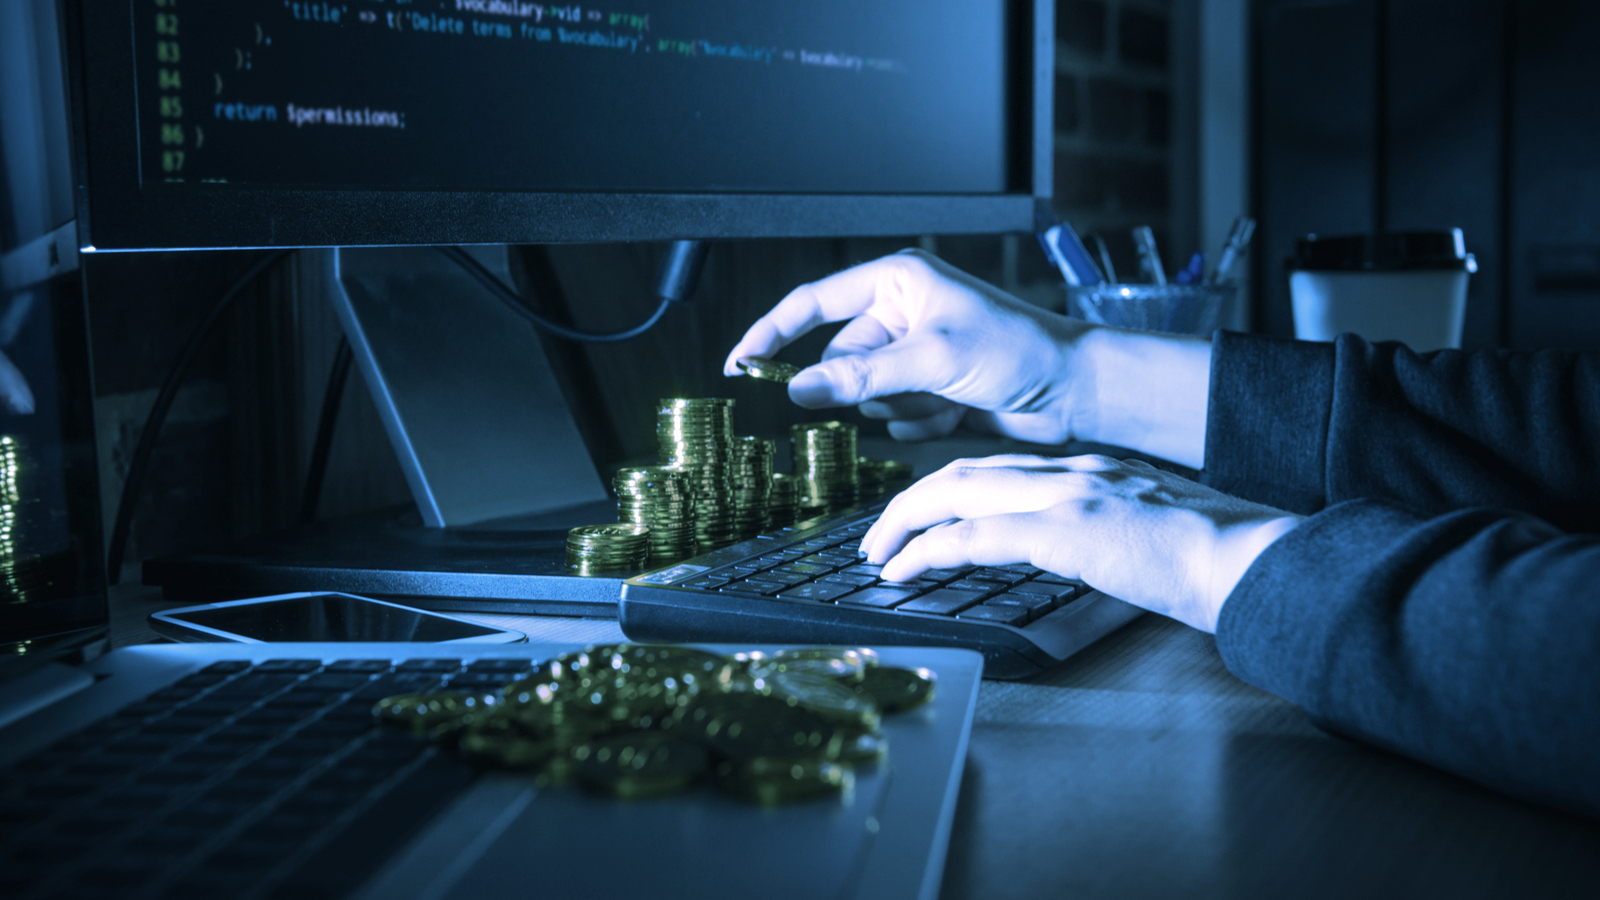 Poly Network Hacker Returns $342 Million